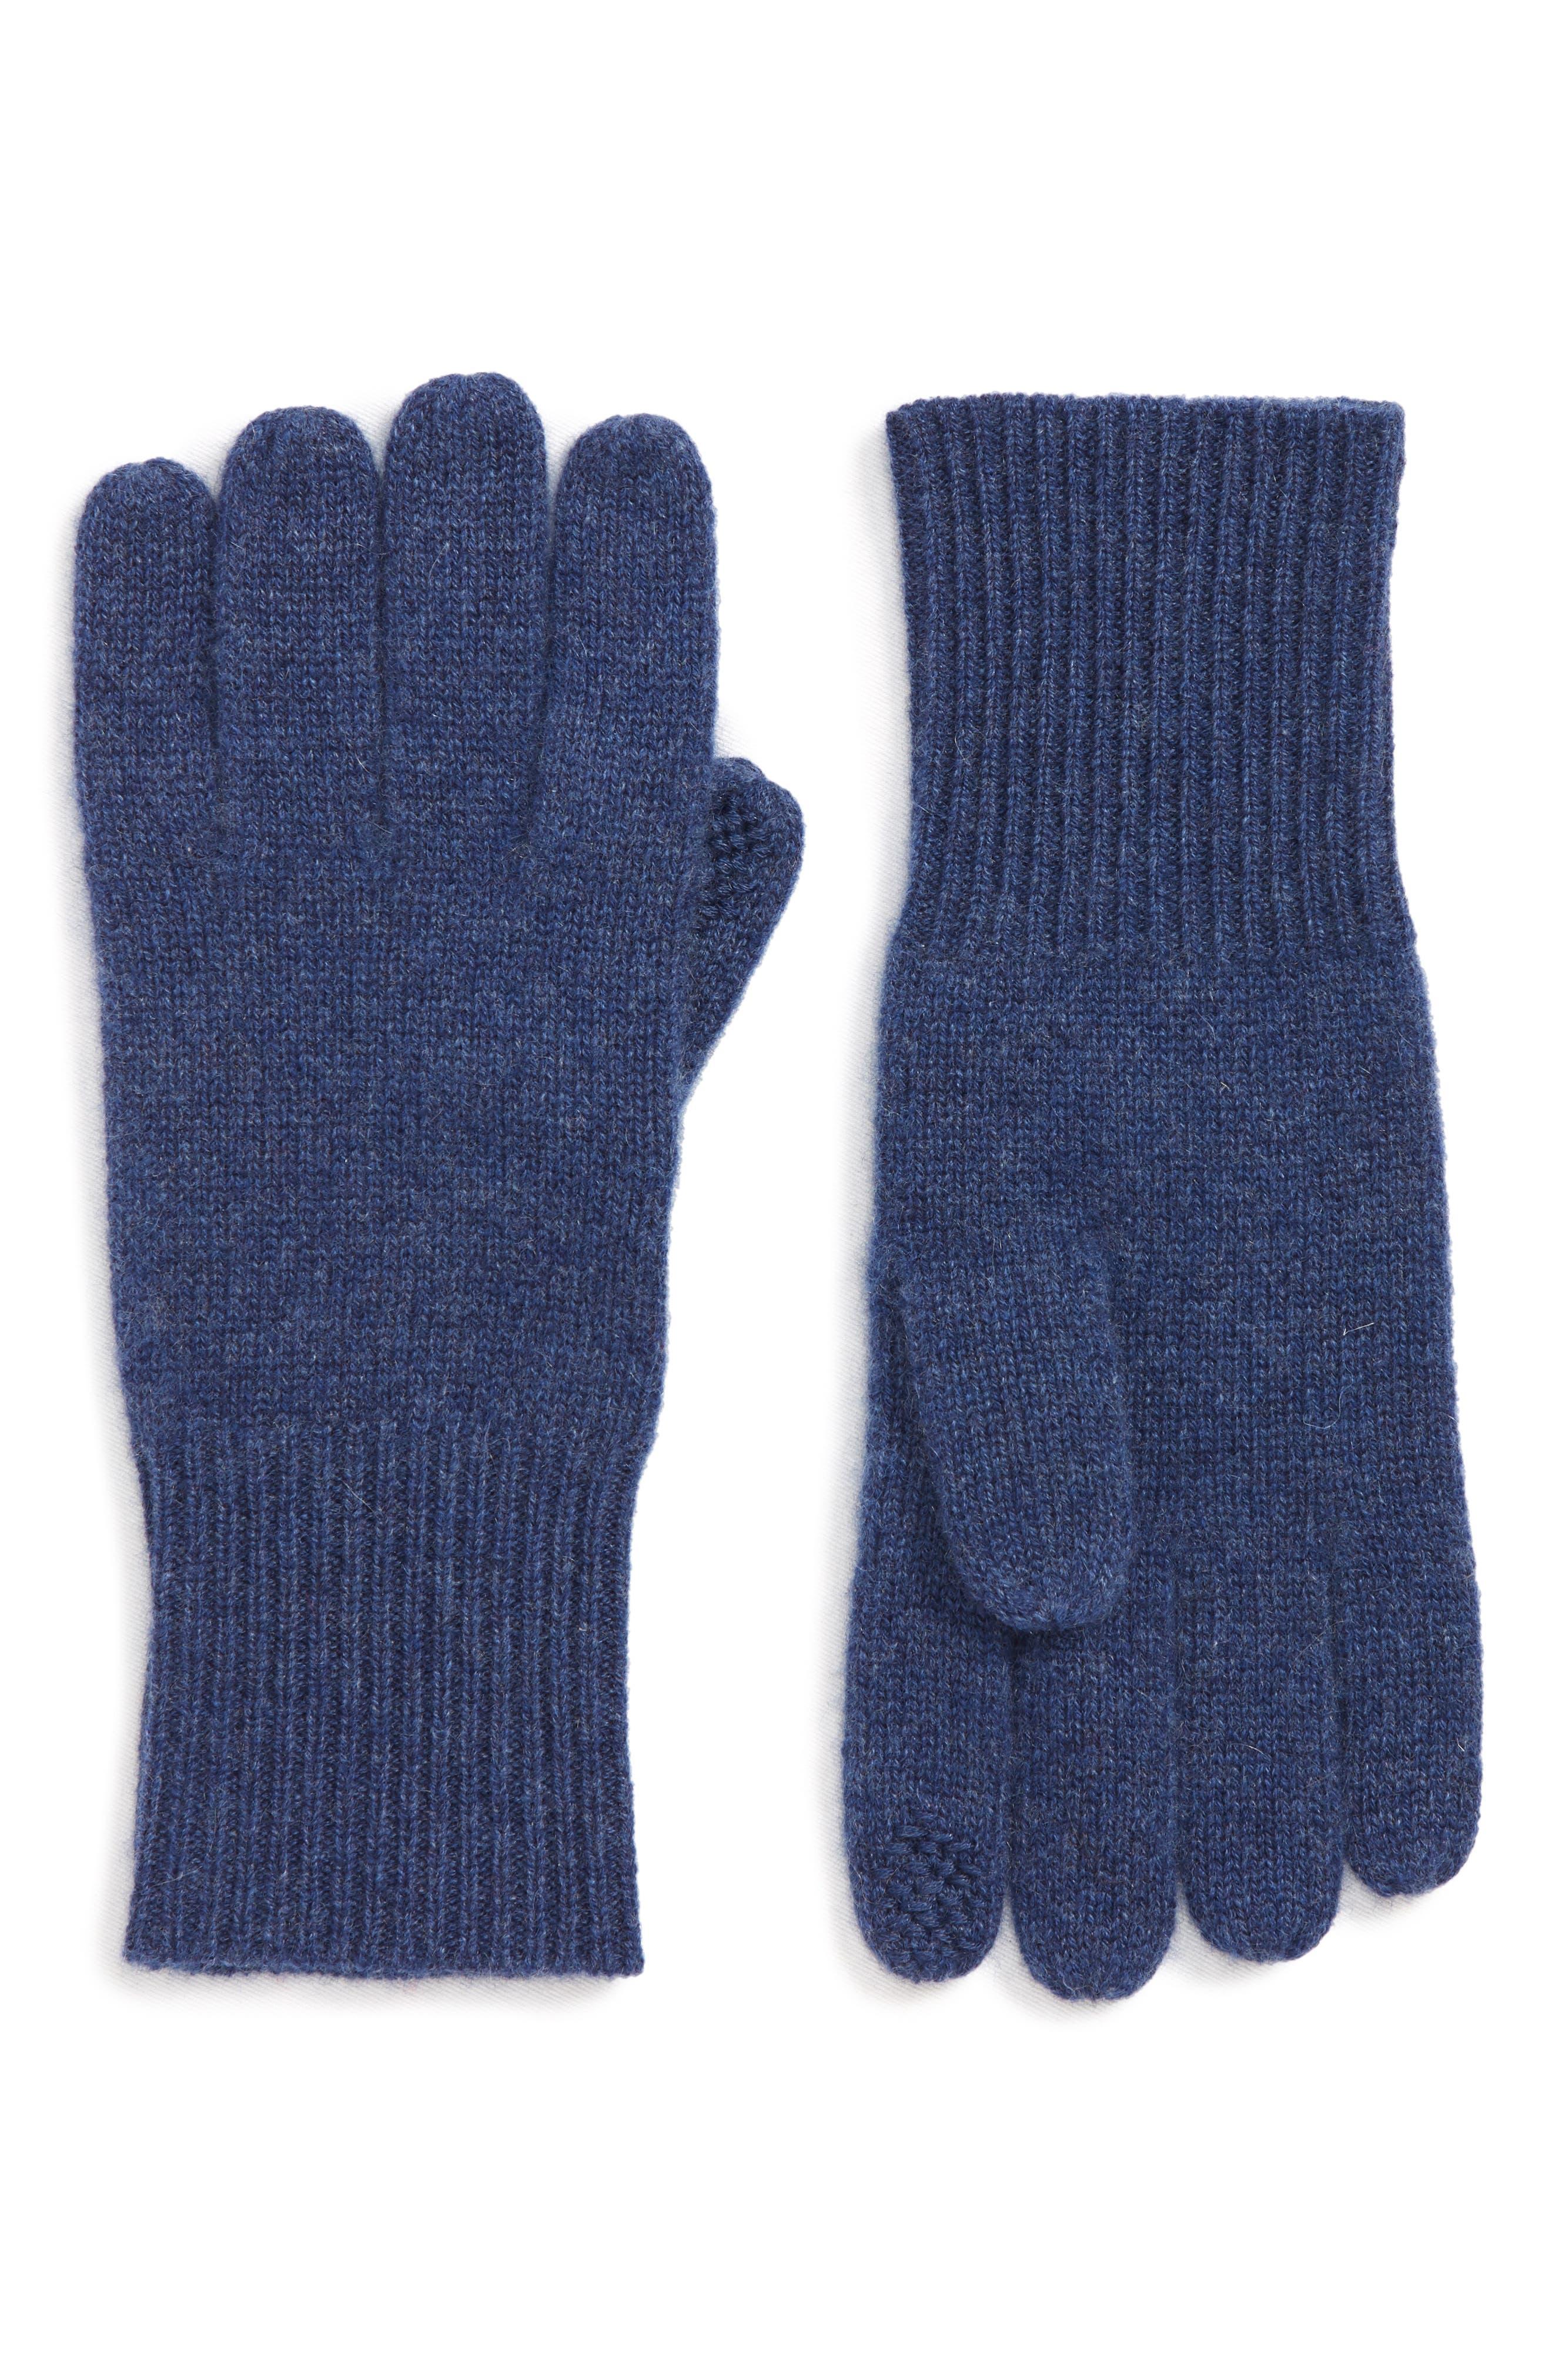 Rib Knit Cashmere Gloves,                             Main thumbnail 1, color,                             BLUE CAPTAIN HEATHER